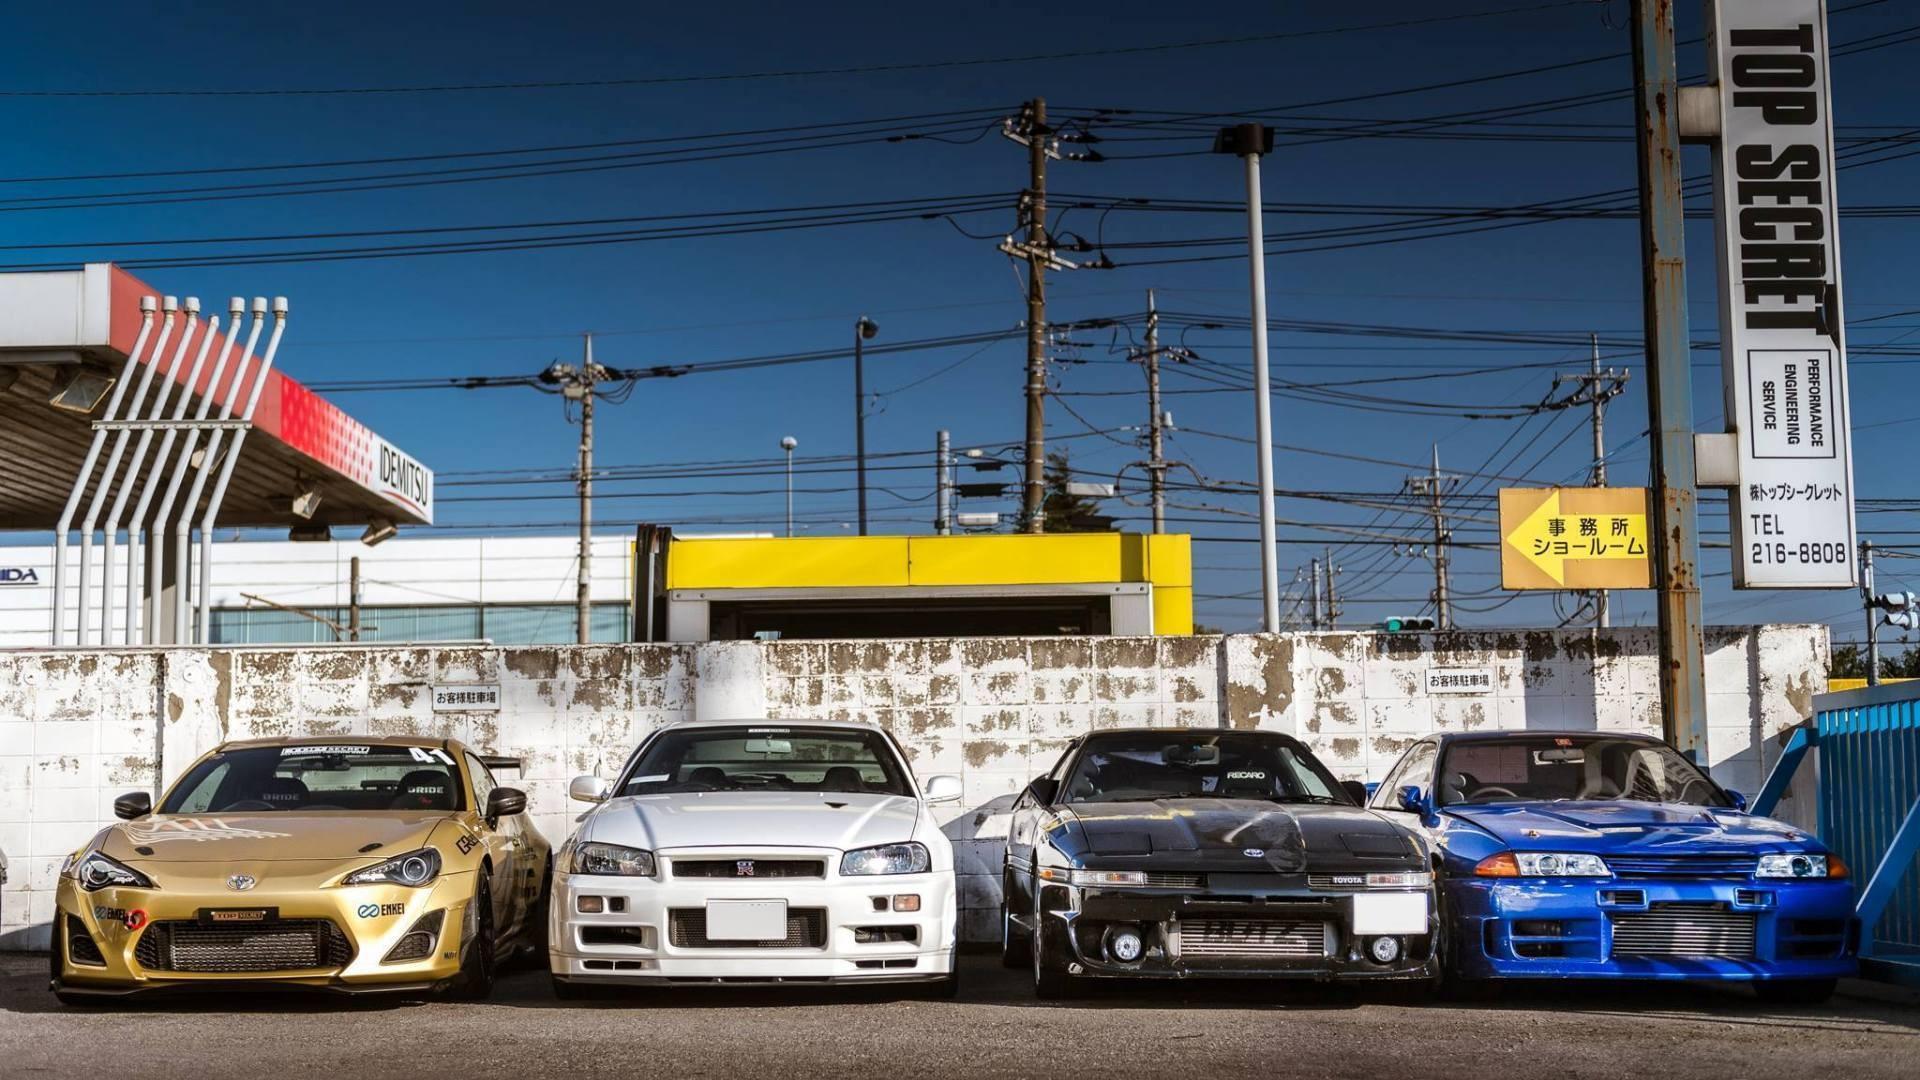 Wallpaper : JDM, Sports Car, Nissan Skyline GT R R34, Toyota Supra, Toyota  Supra MK3, Nissan GT R R32, Toyota GT 86, Nissan Skyline GT R R 32,  Supercar, ...